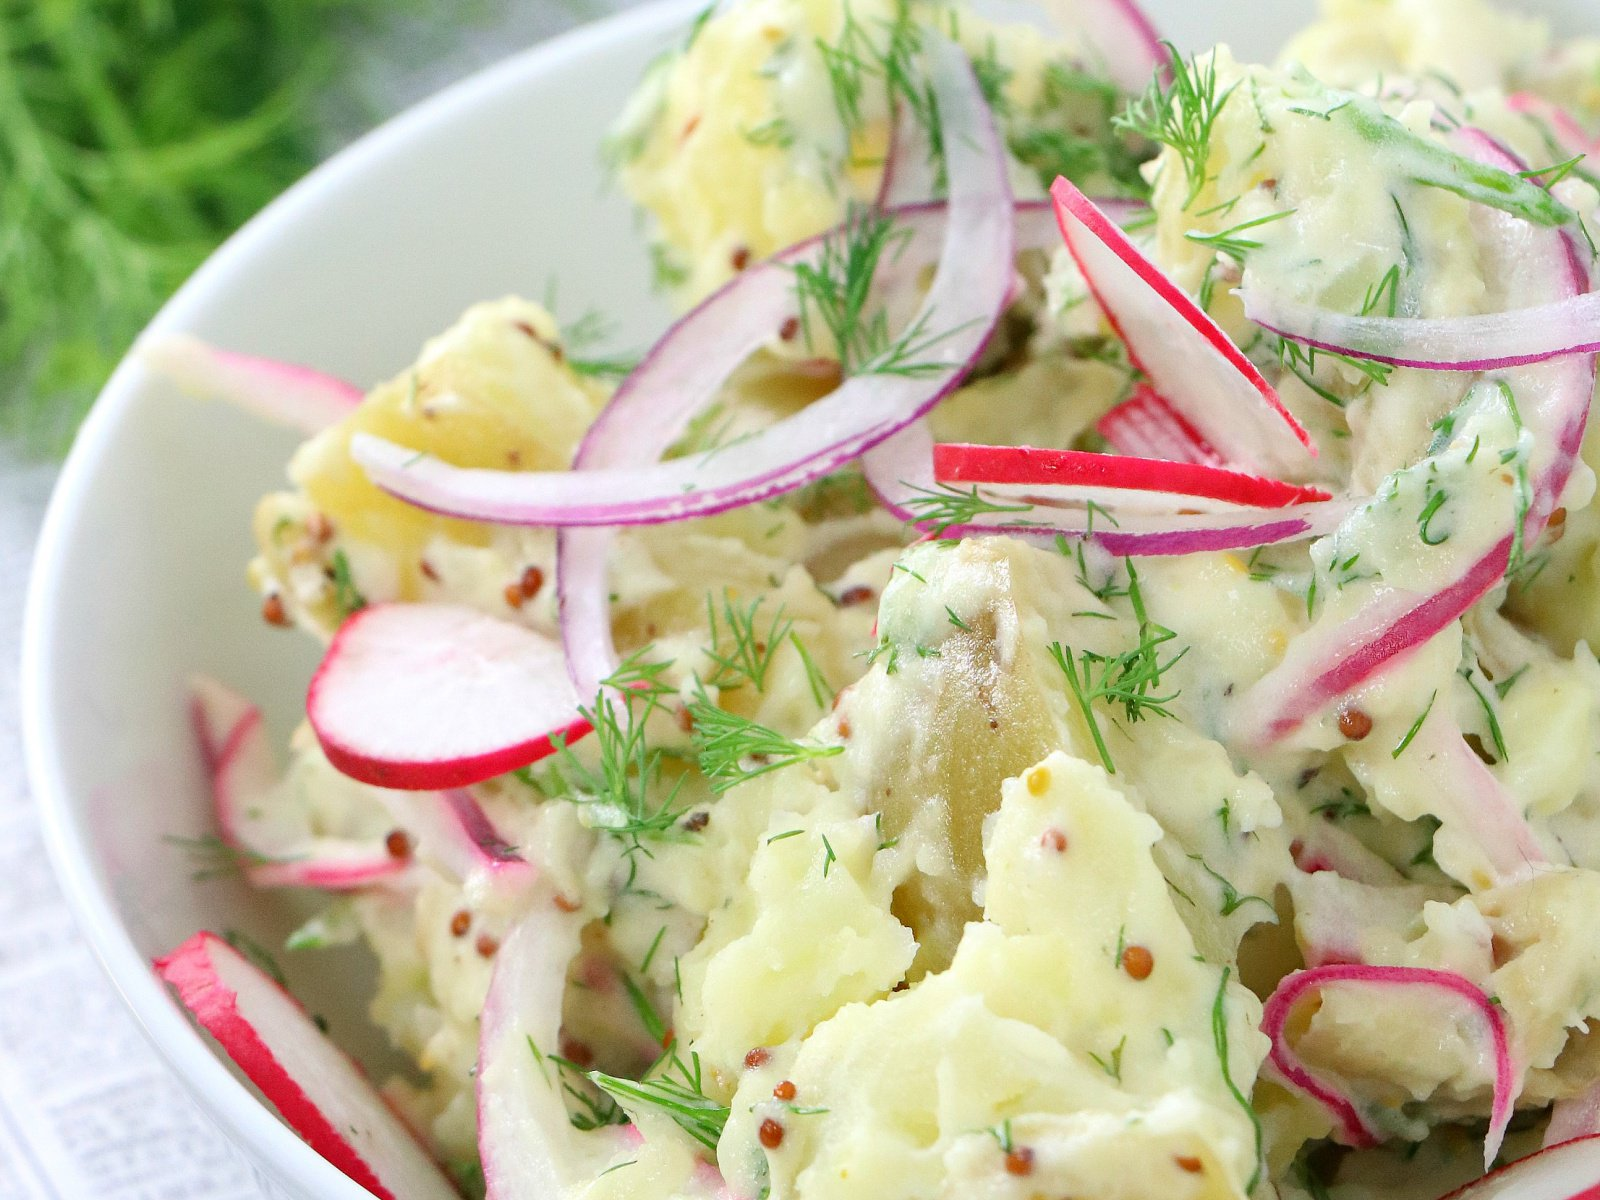 Creamy Dill Potato Salad